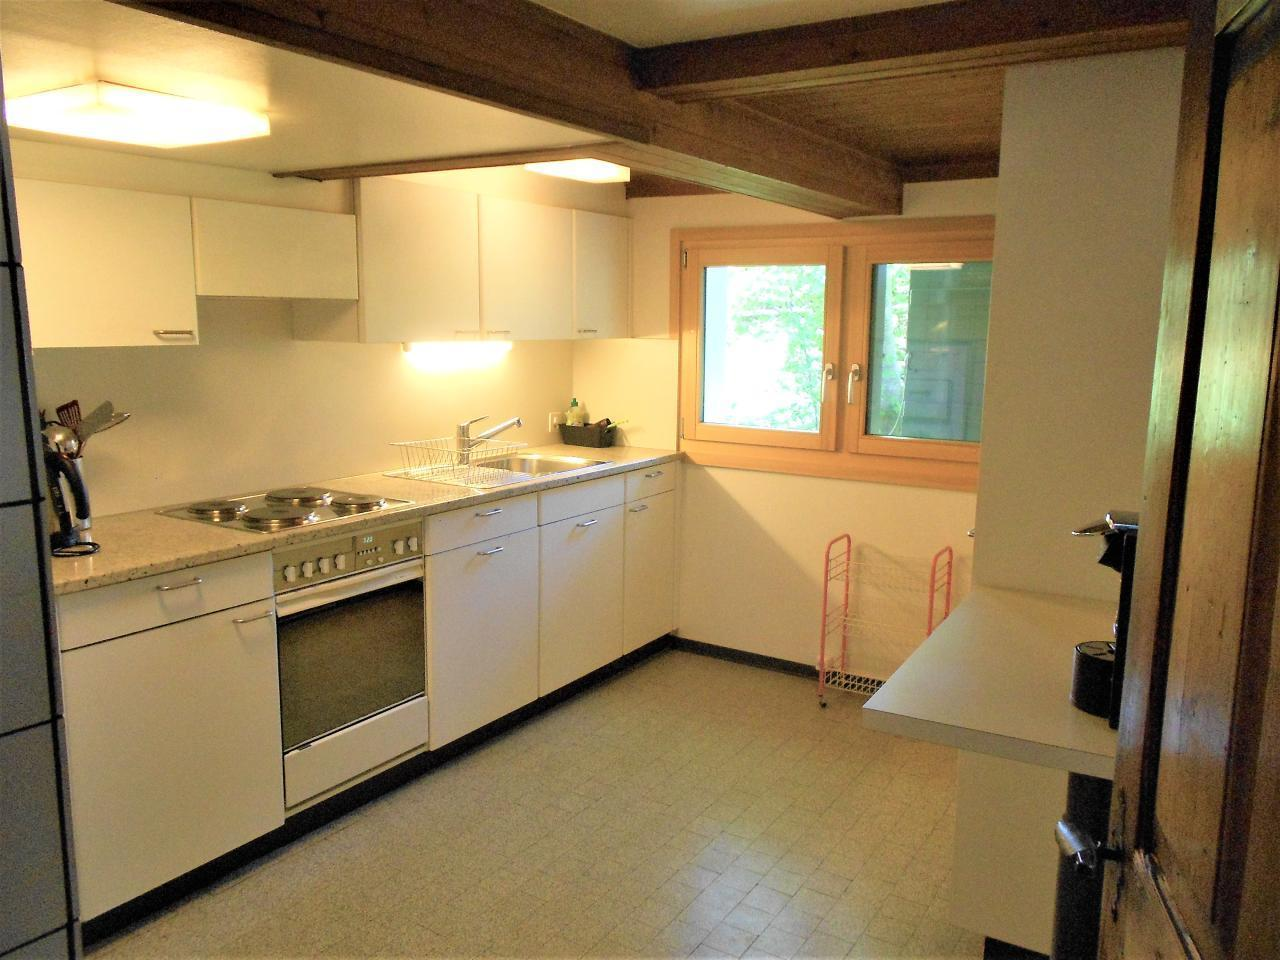 Maison de vacances Alpenrösli in Nesslau (2640830), Nesslau, Toggenbourg, Suisse Orientale, Suisse, image 4